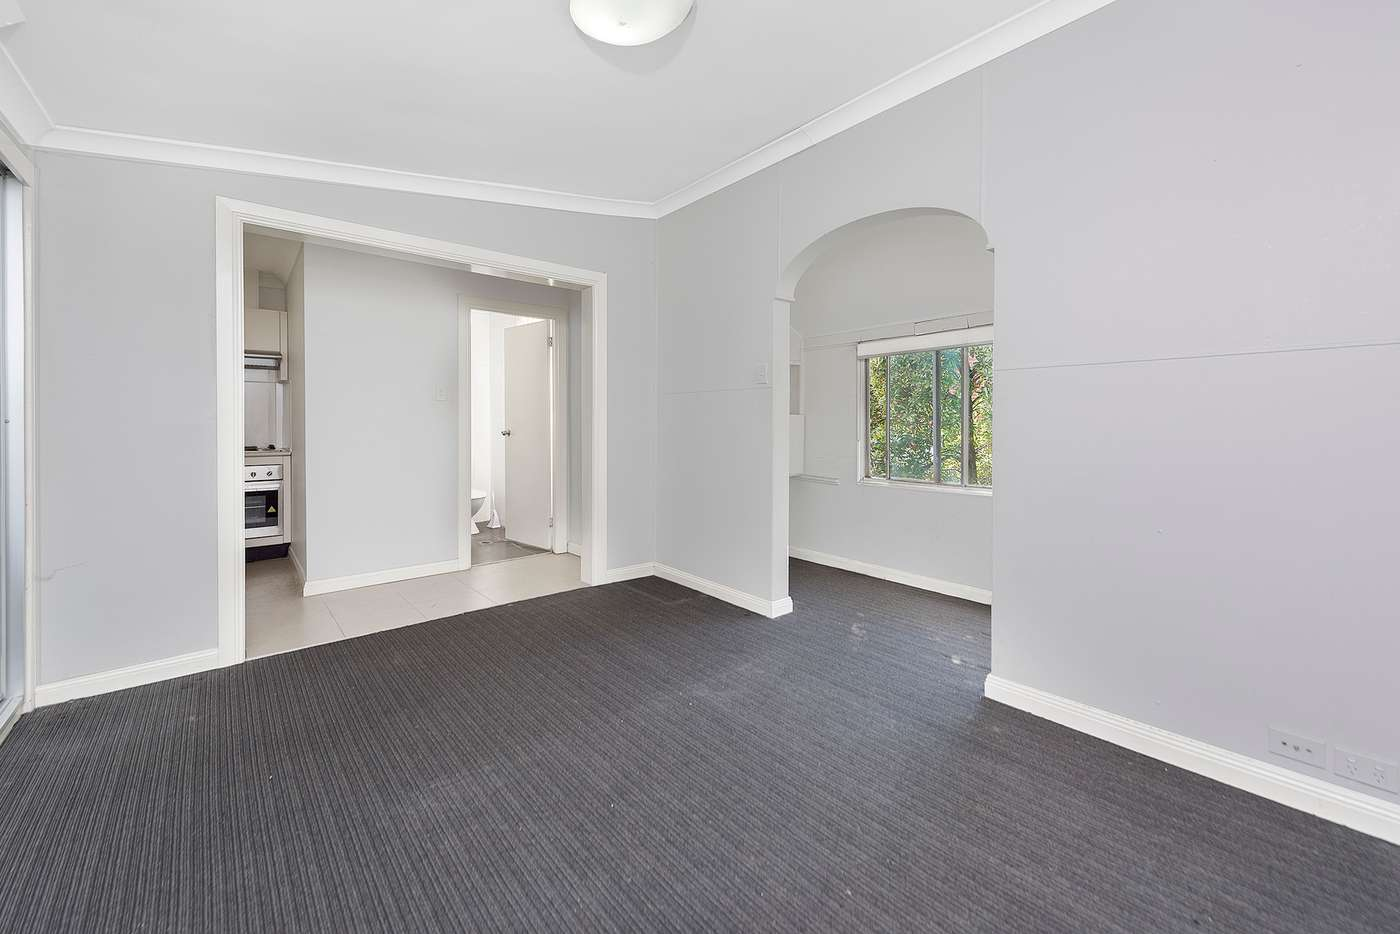 Main view of Homely studio listing, 5/8 Ormond Street, Ashfield NSW 2131